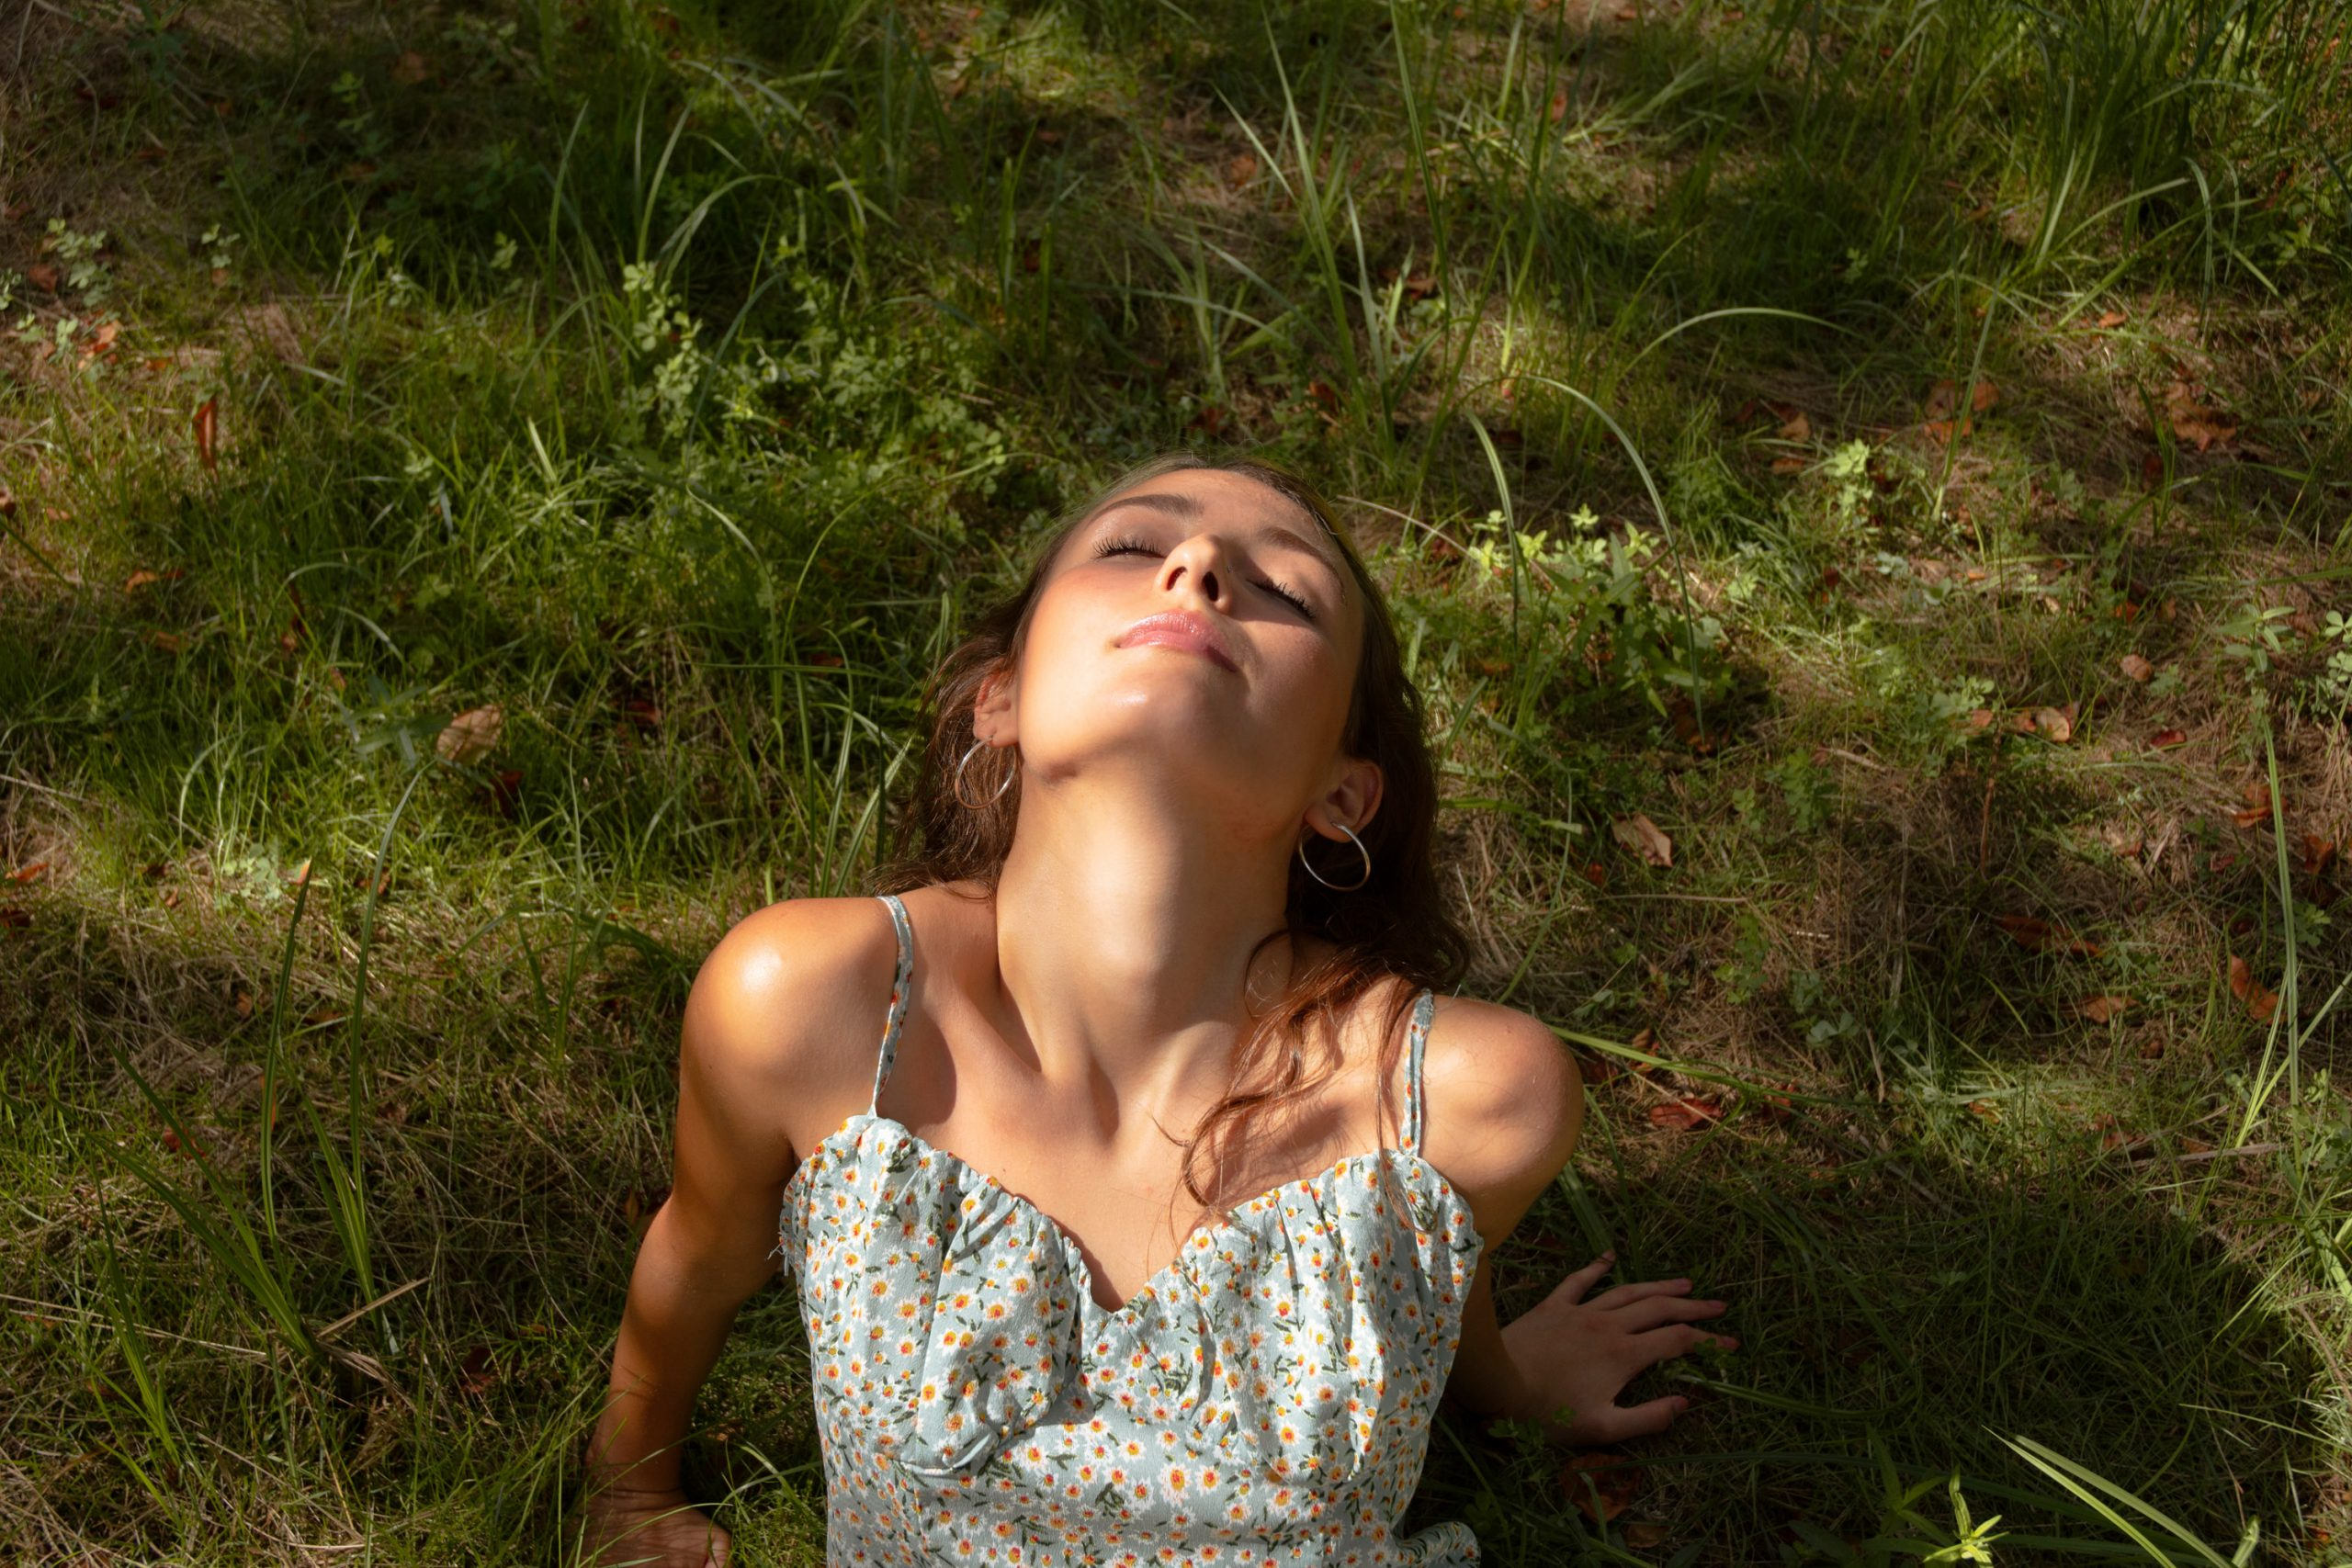 Categorie: Glamour, Fashion, Portrait - Photographer: ELEONORA PIRAS - Model: ALESSANDRA PEDRONI - Assistant: GAIA GENTINA - Location: Milano, MI, Italia